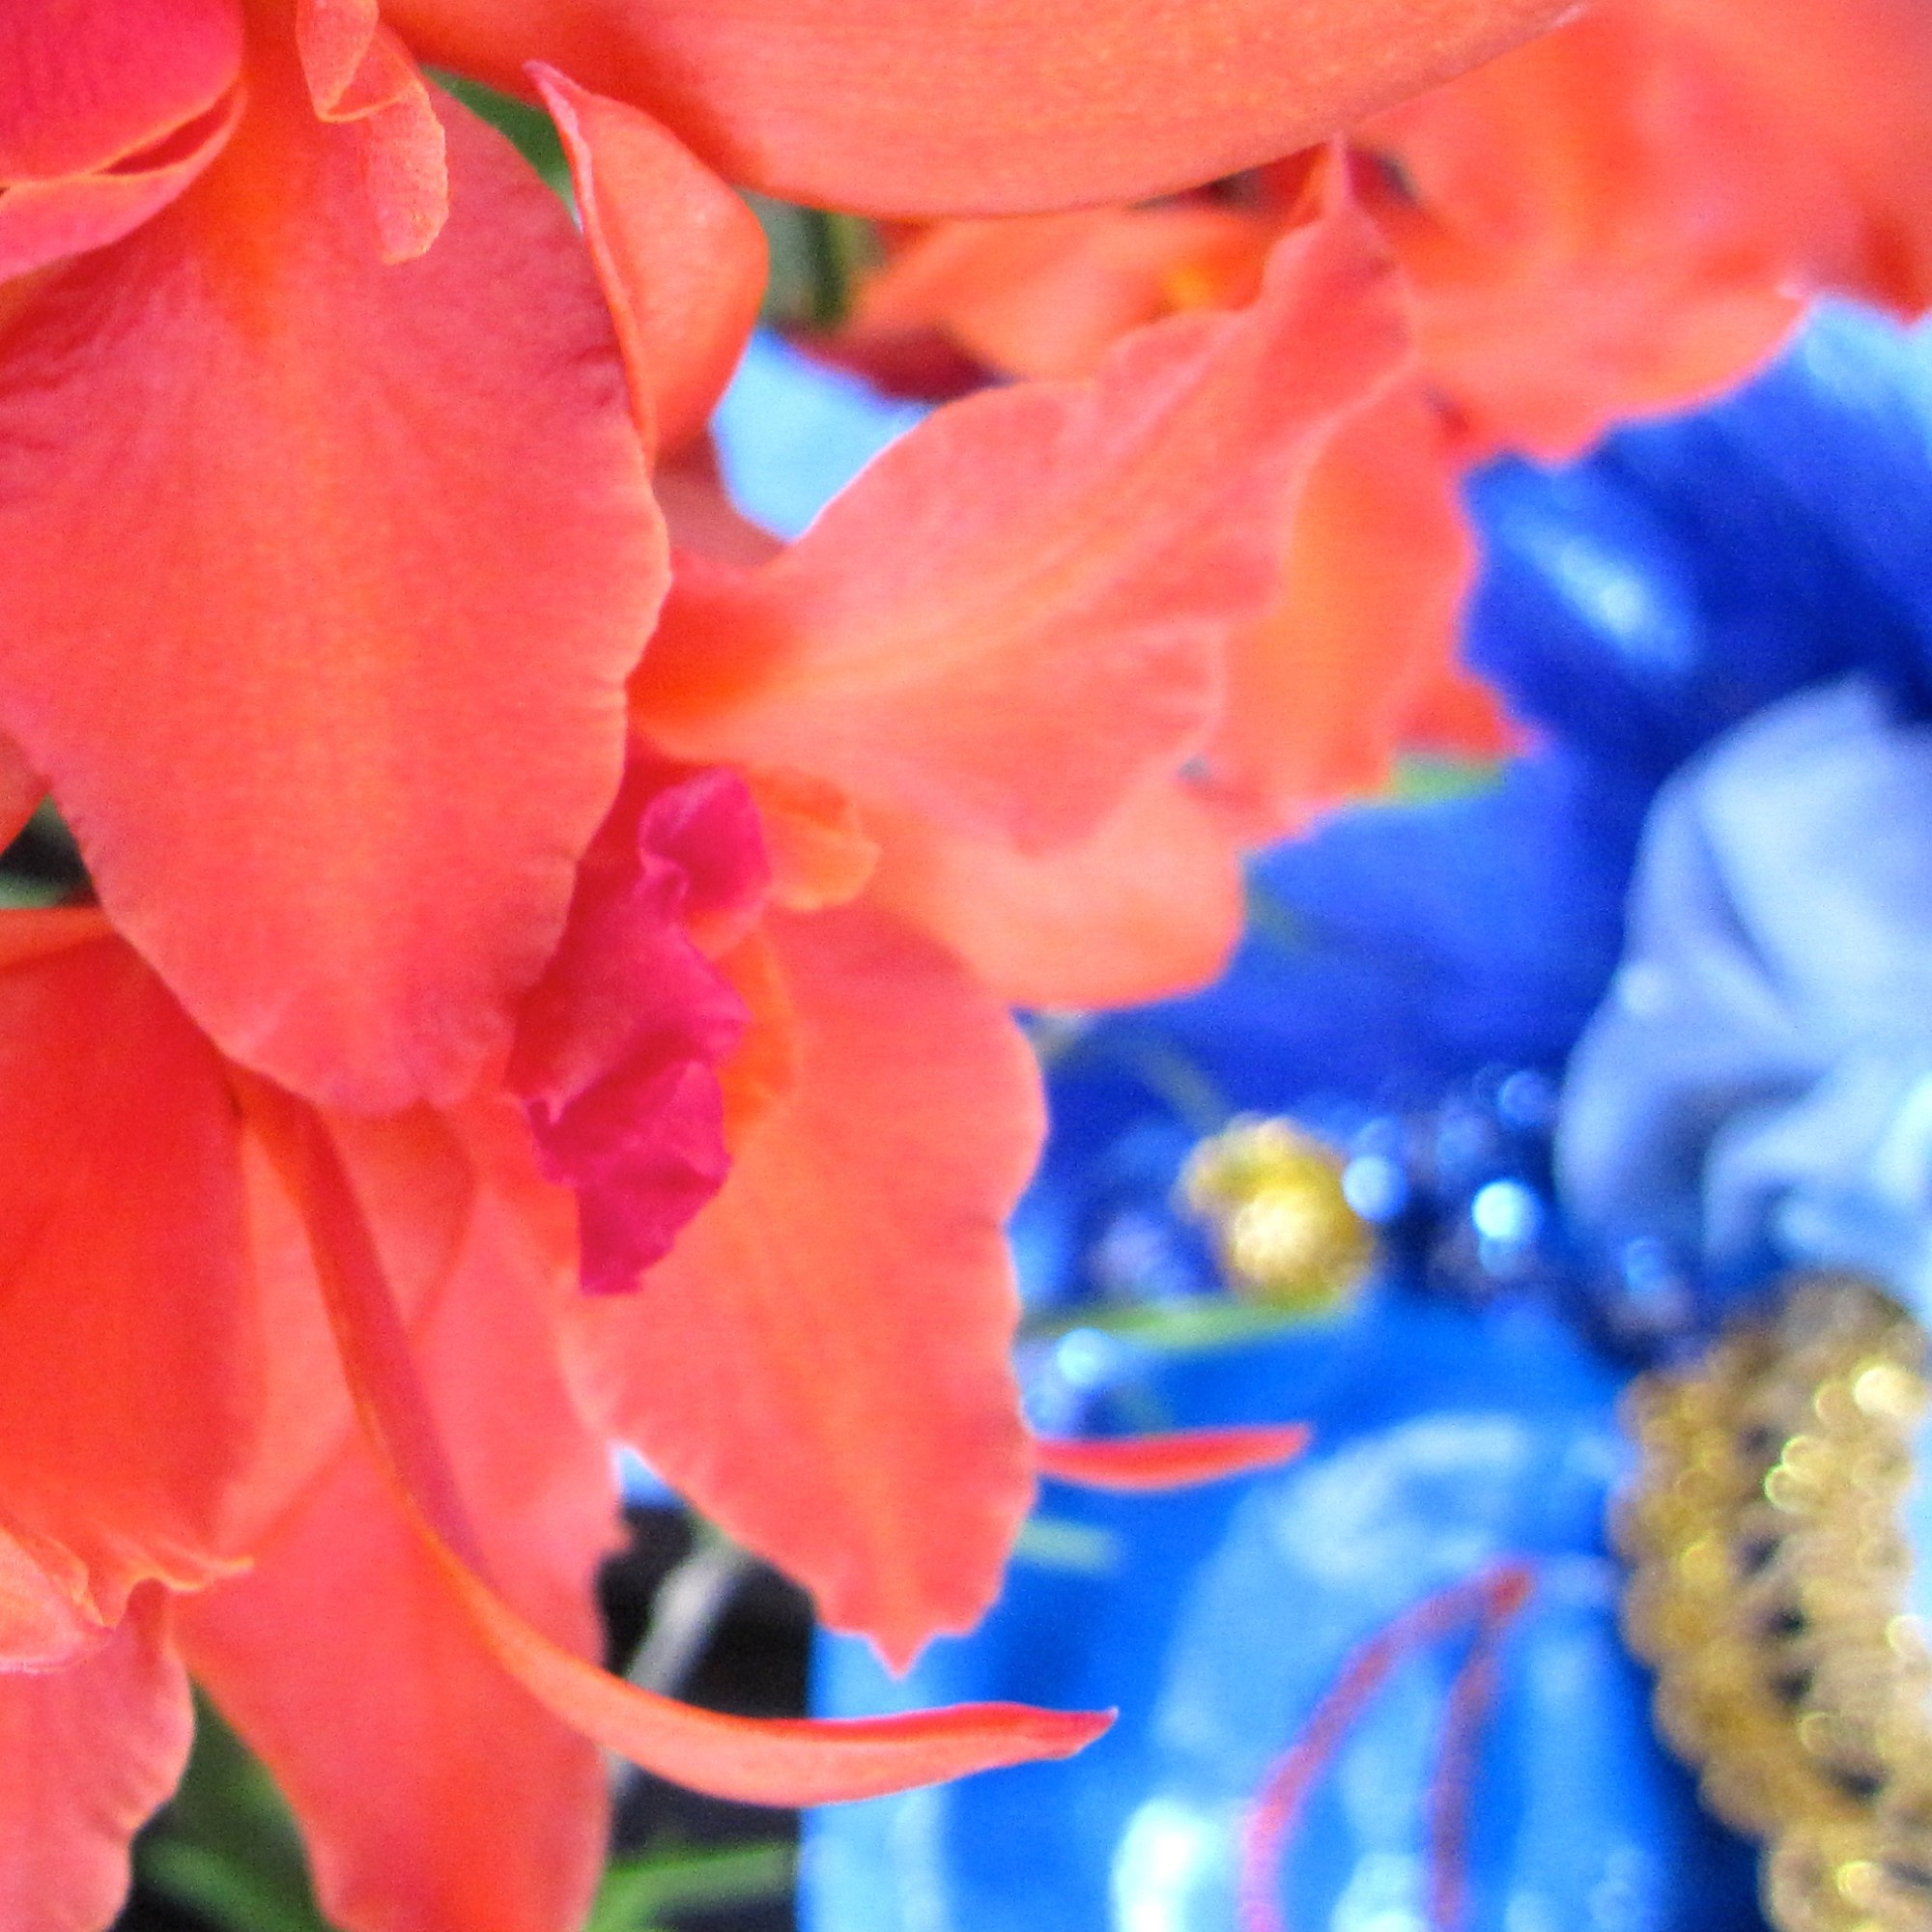 Orchids 2 - Lee Taiz